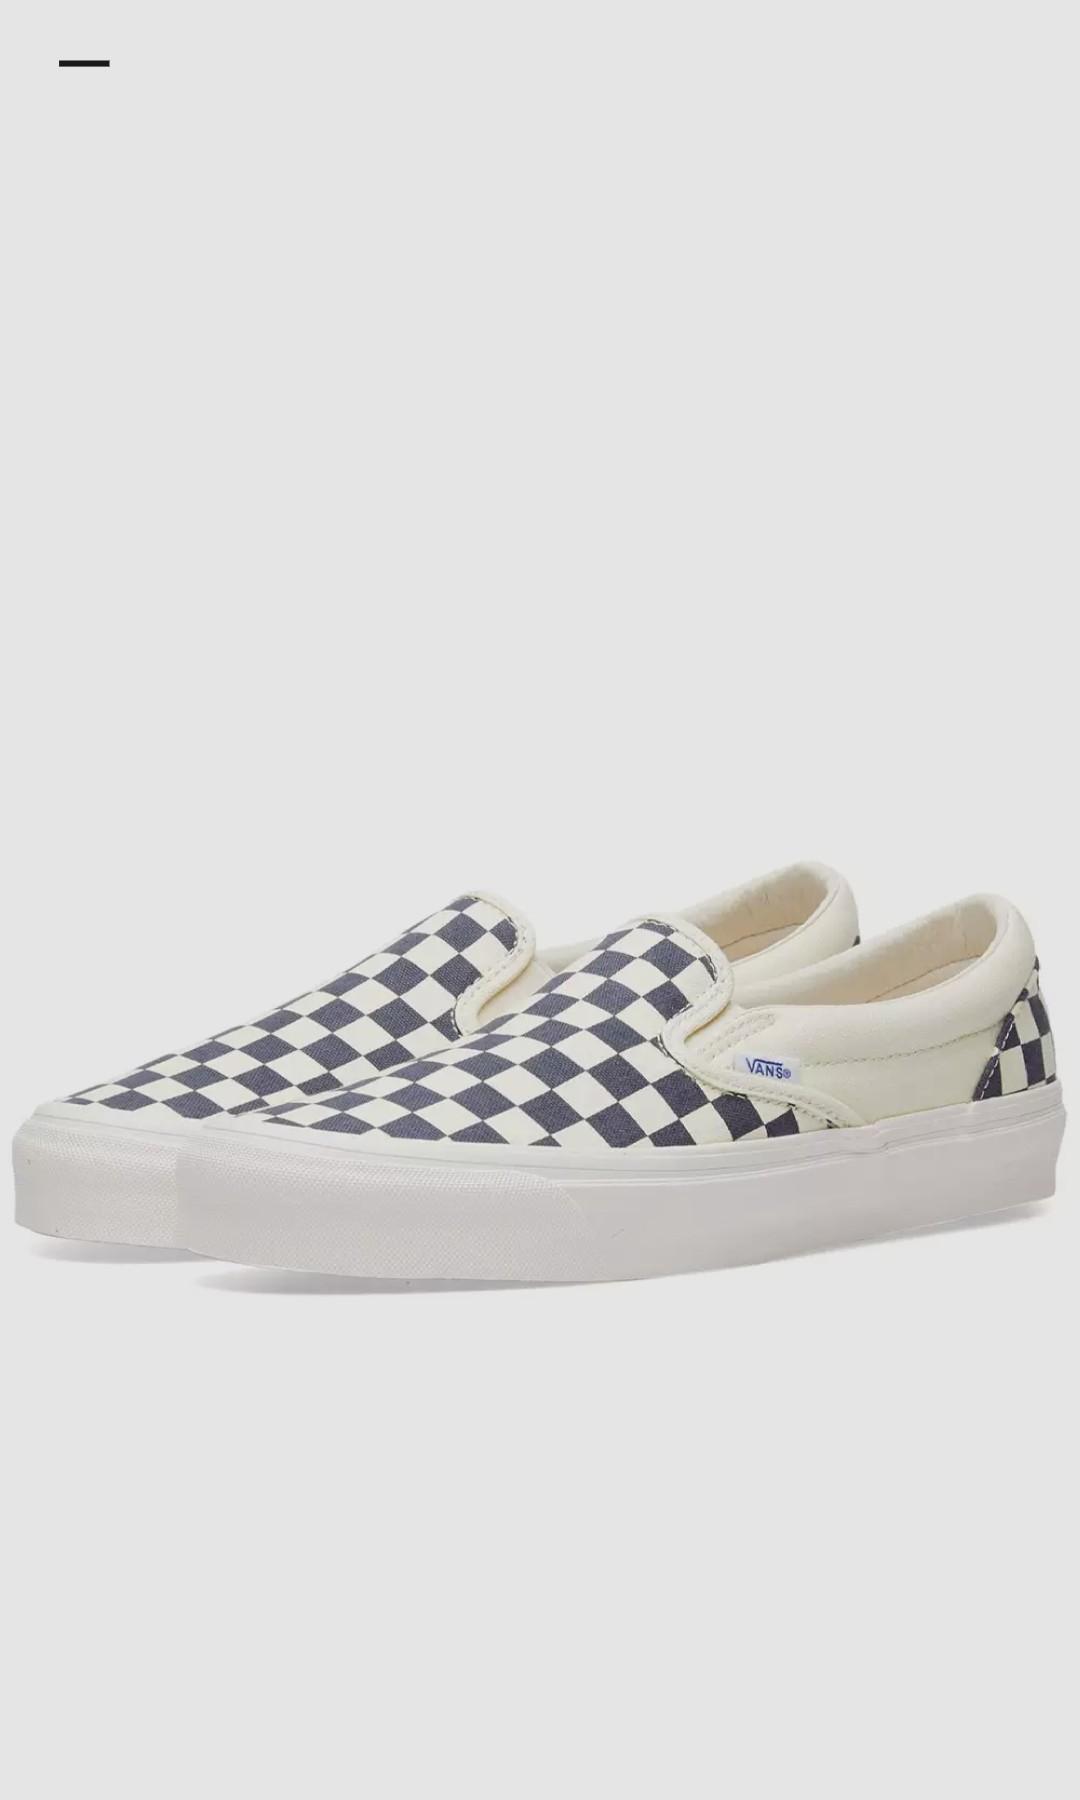 bff5876865 Men sneaker(vans slip on)